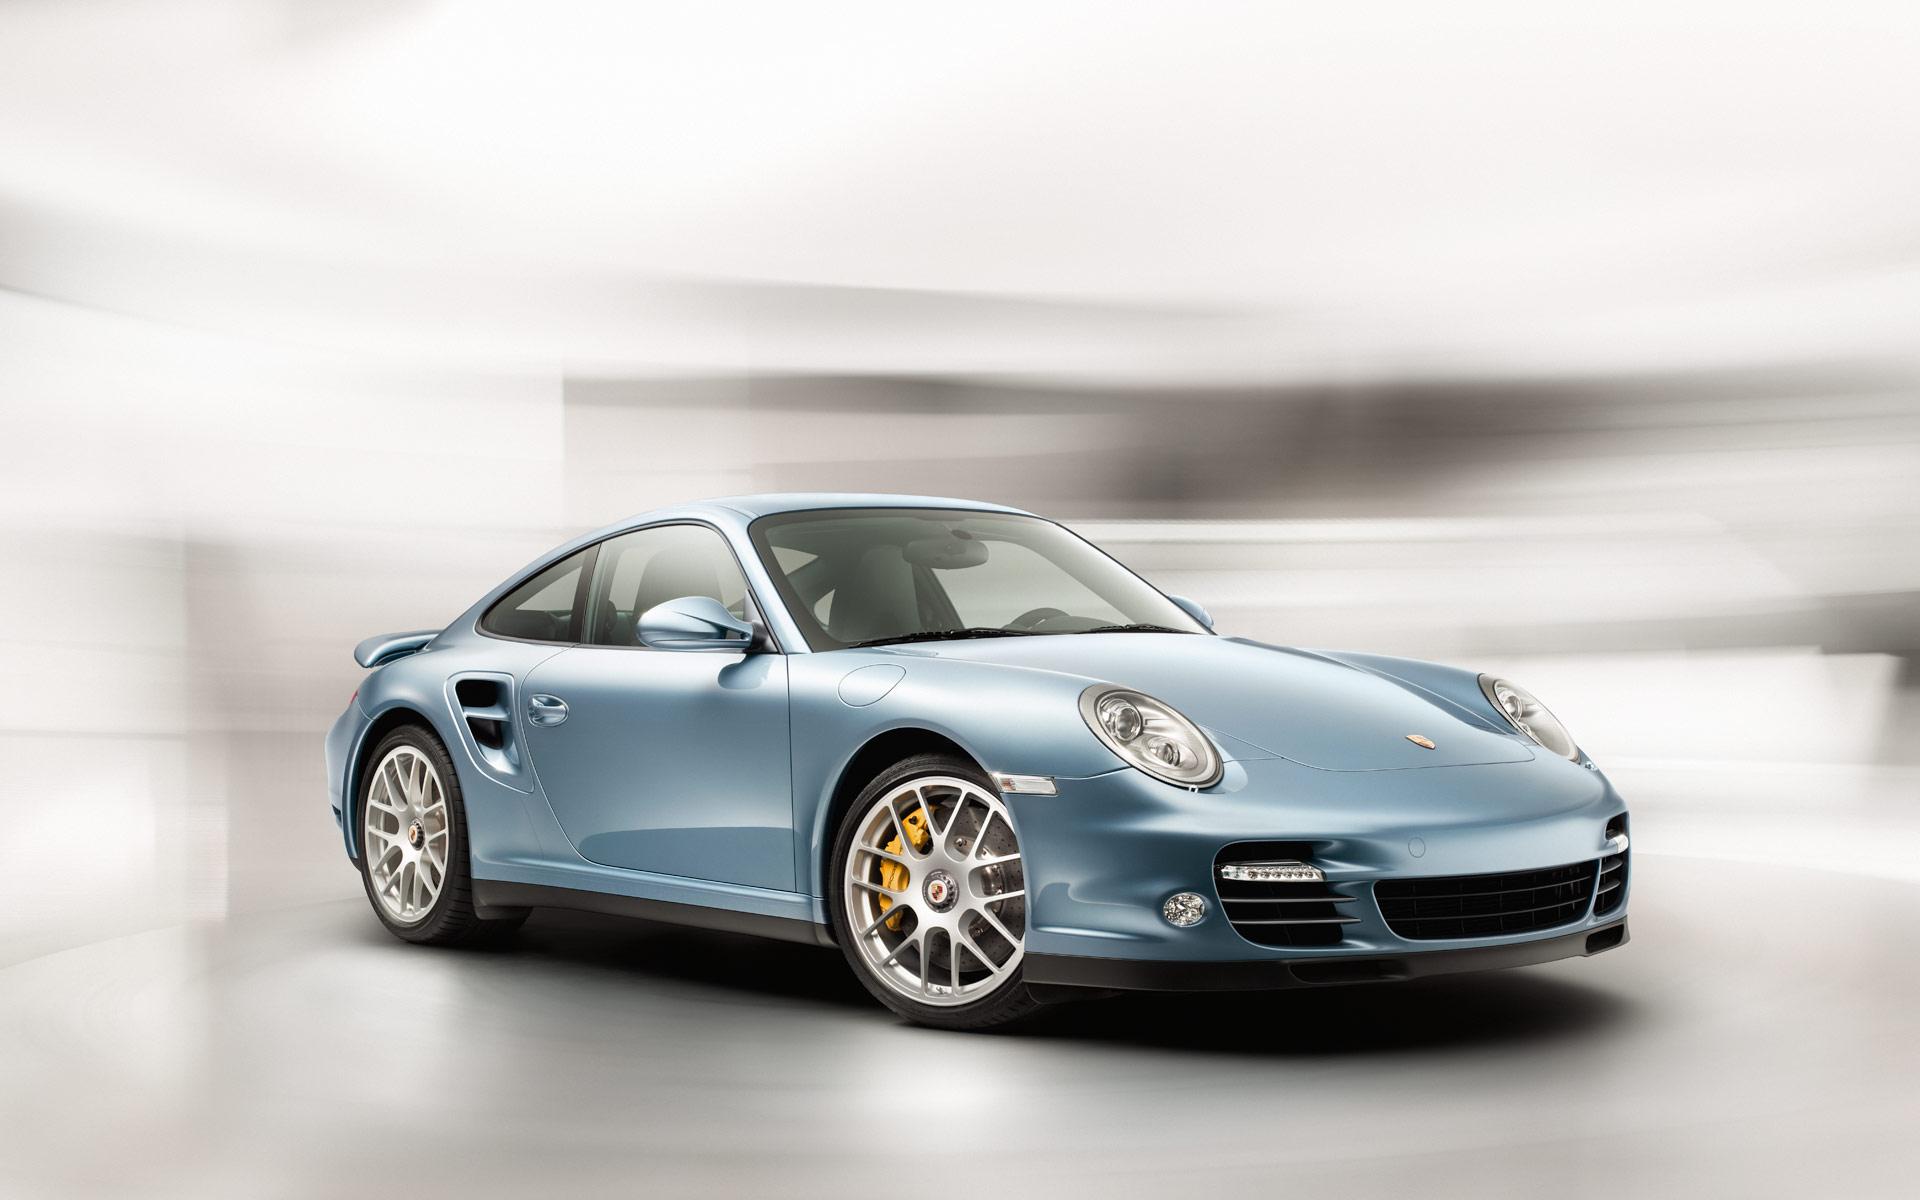 Porsche 911 Turbo S Wallpaper HD Car Wallpapers 1920x1200